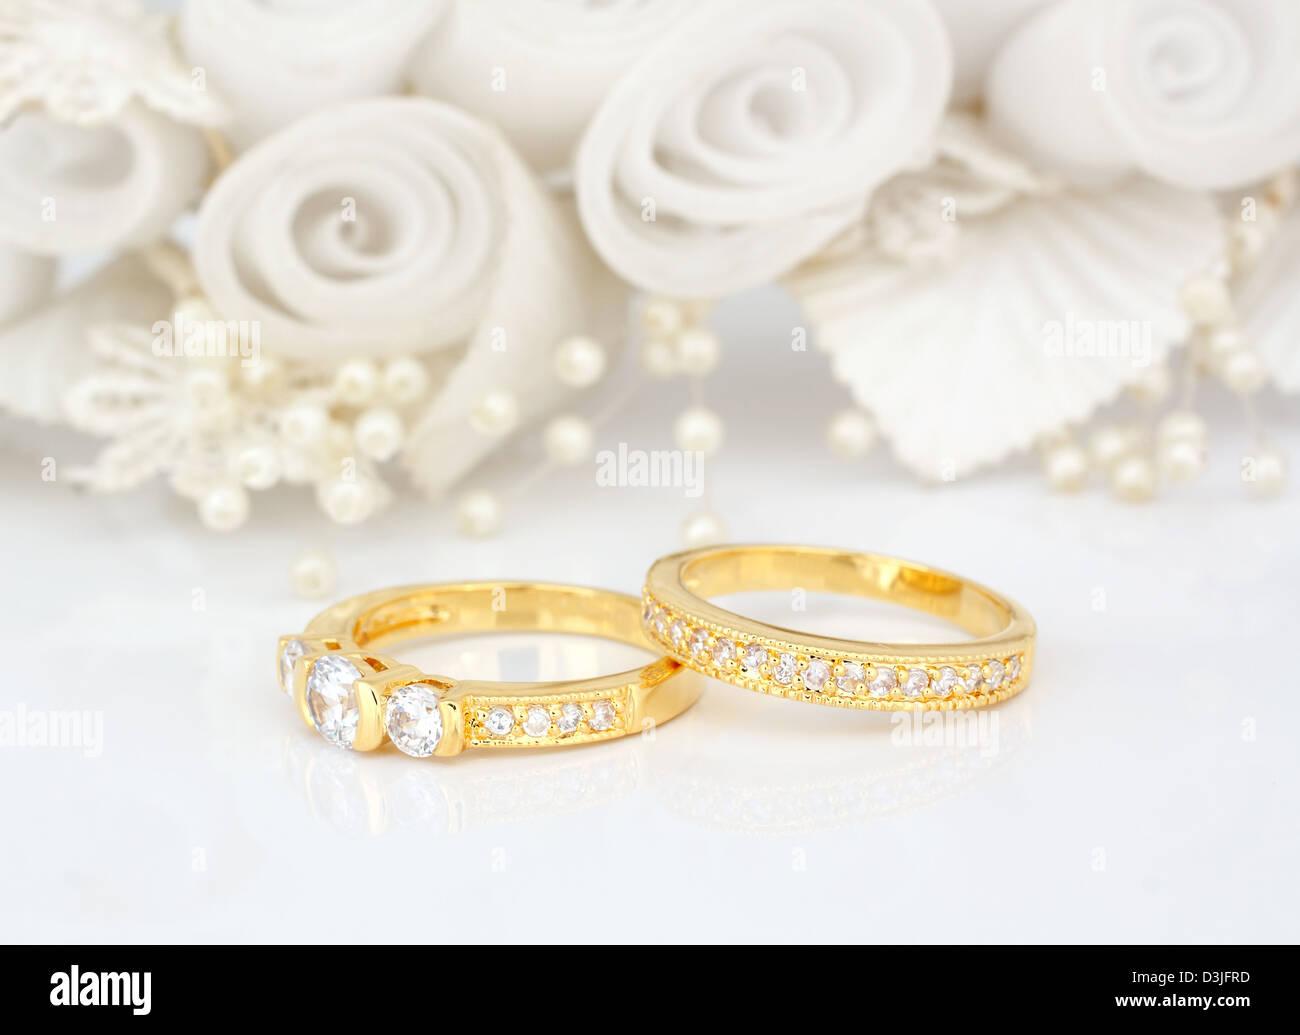 Gold Wedding Rings On Flowers Background Stock Photo 53882625 Alamy